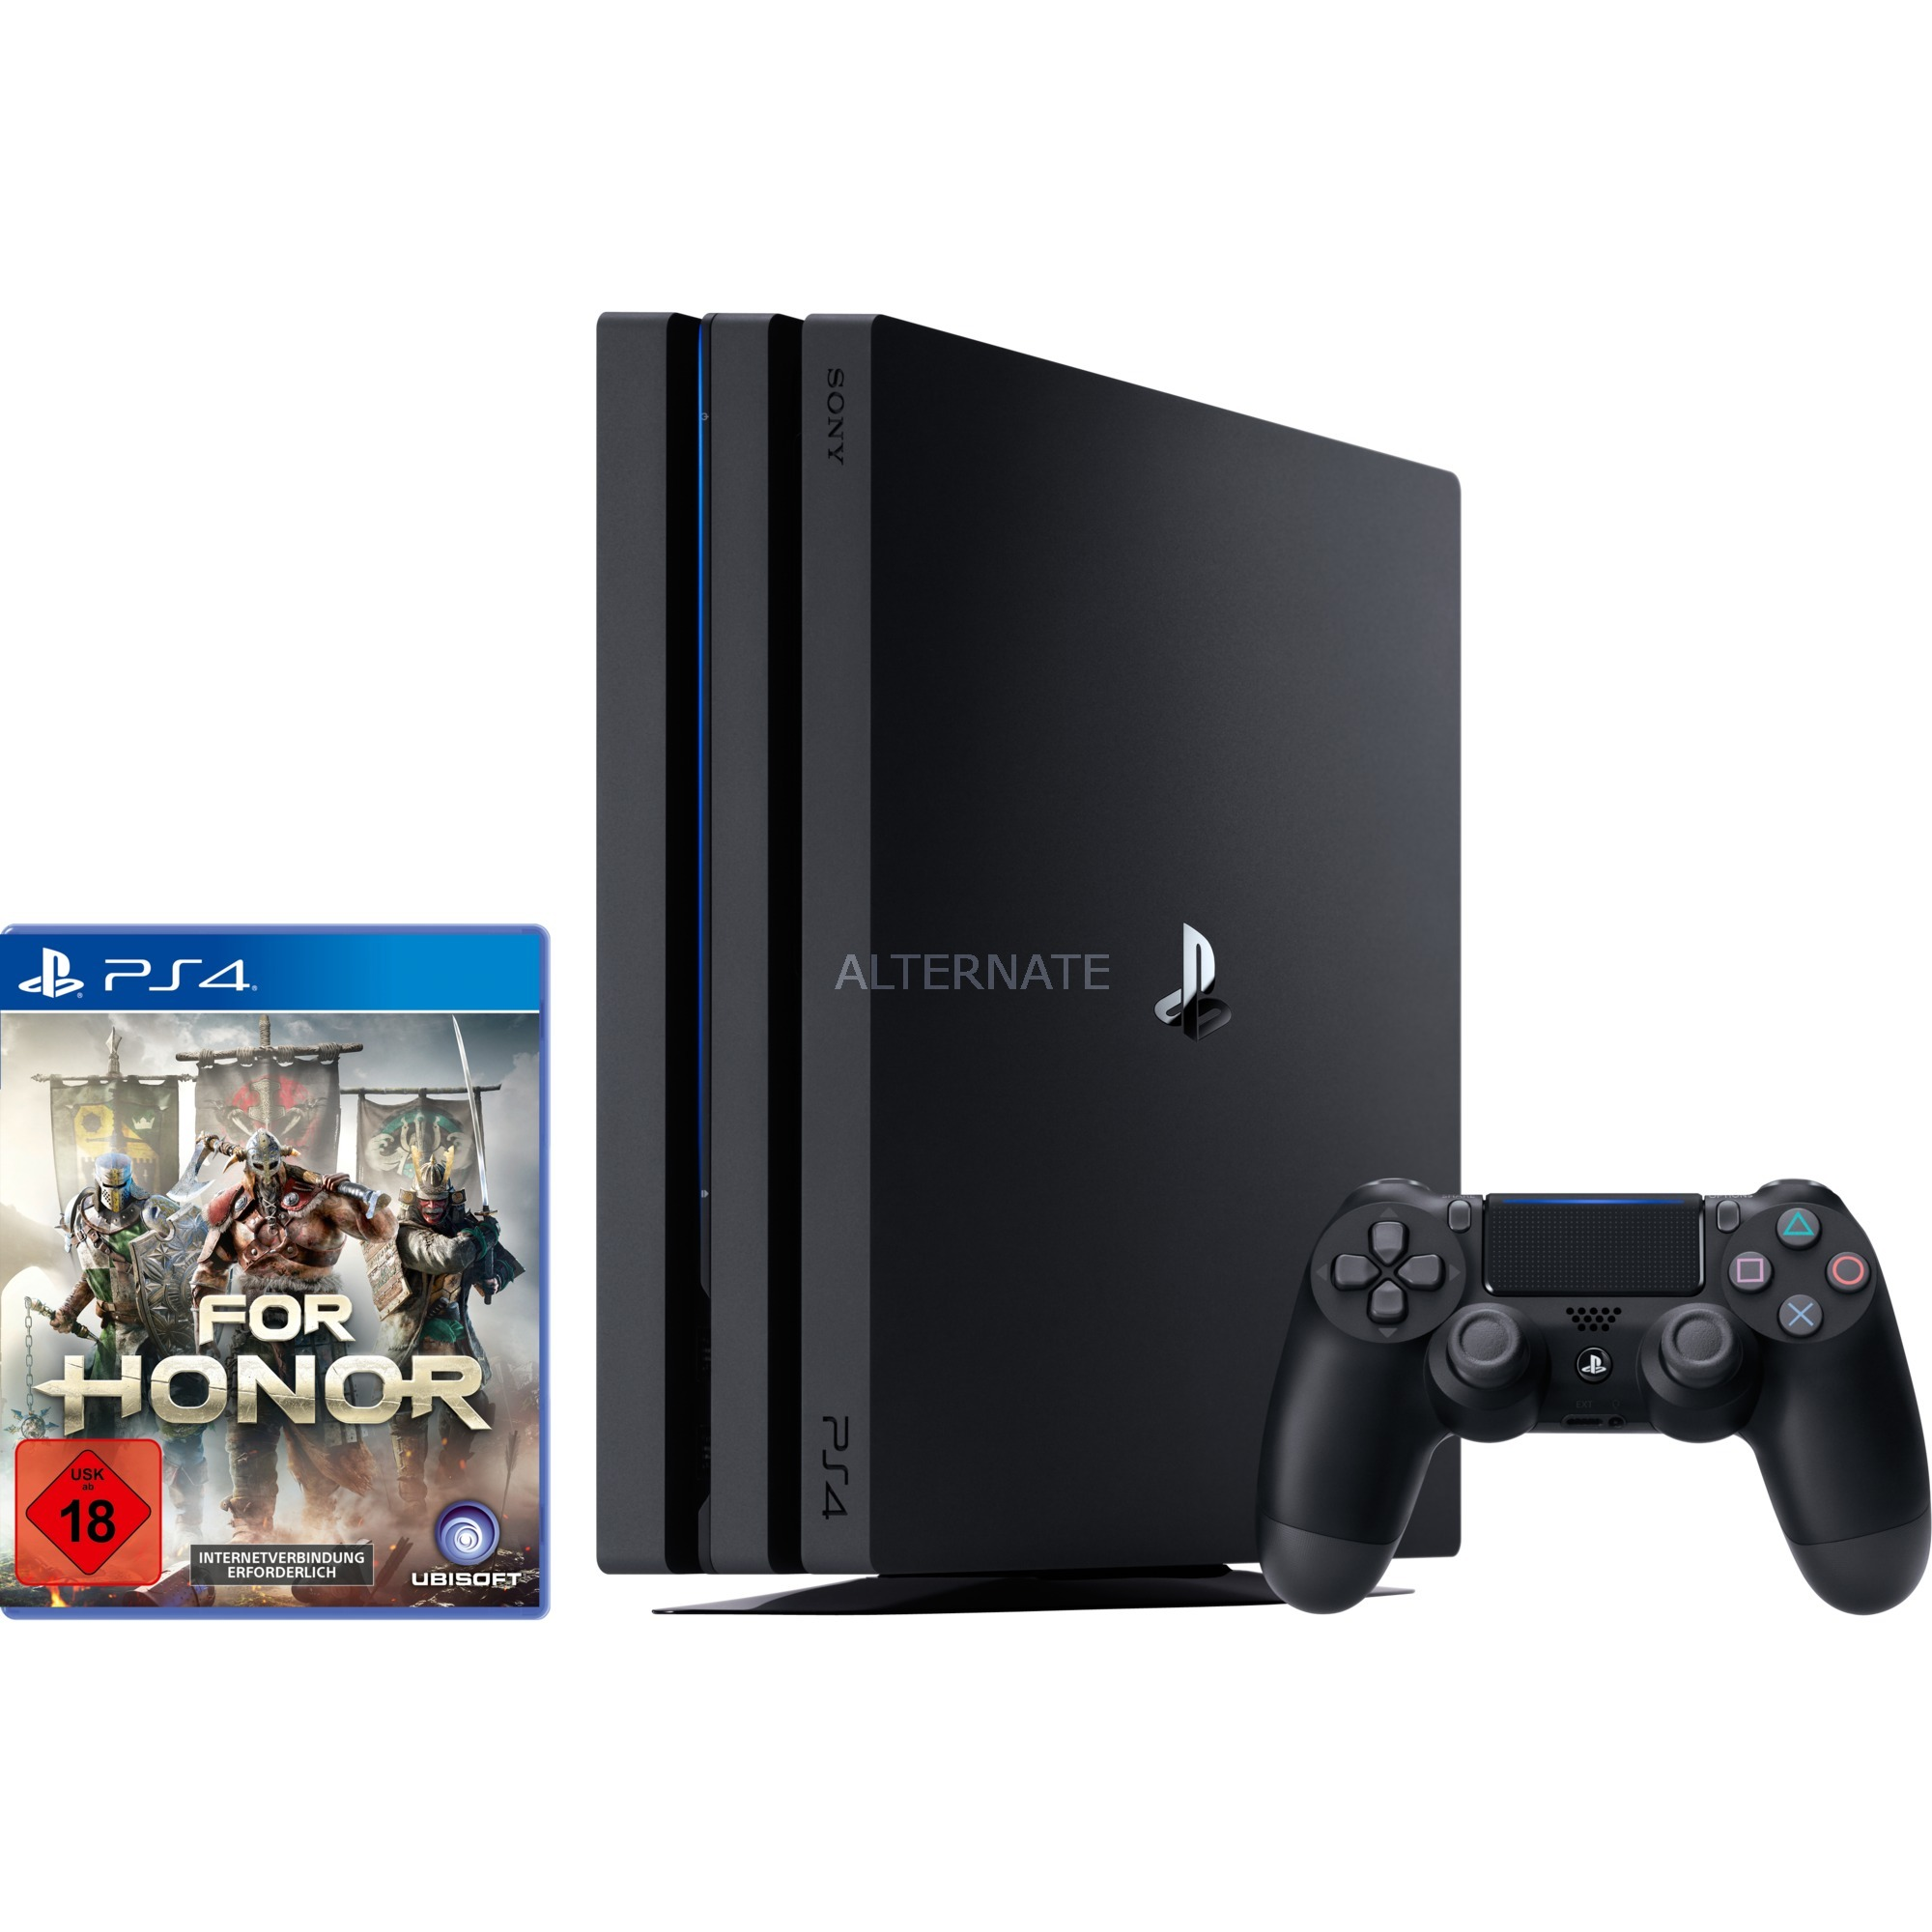 PlayStation 4 Pro, Videoconsola